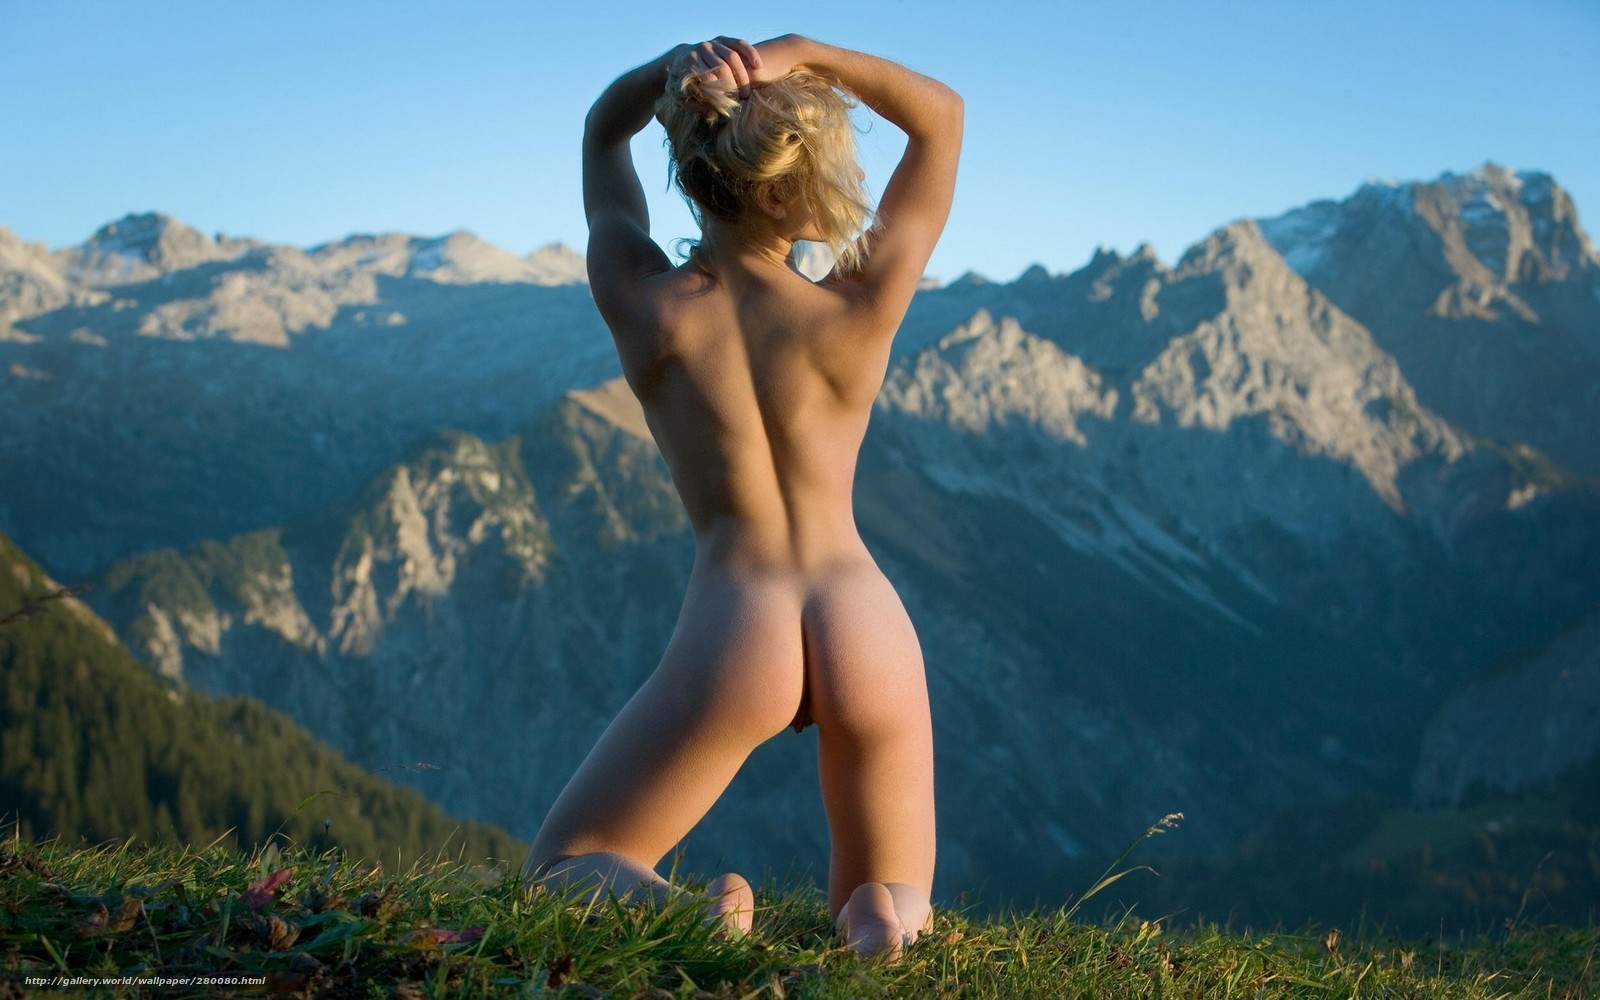 Эротика на фоне пейзажей 7 фотография